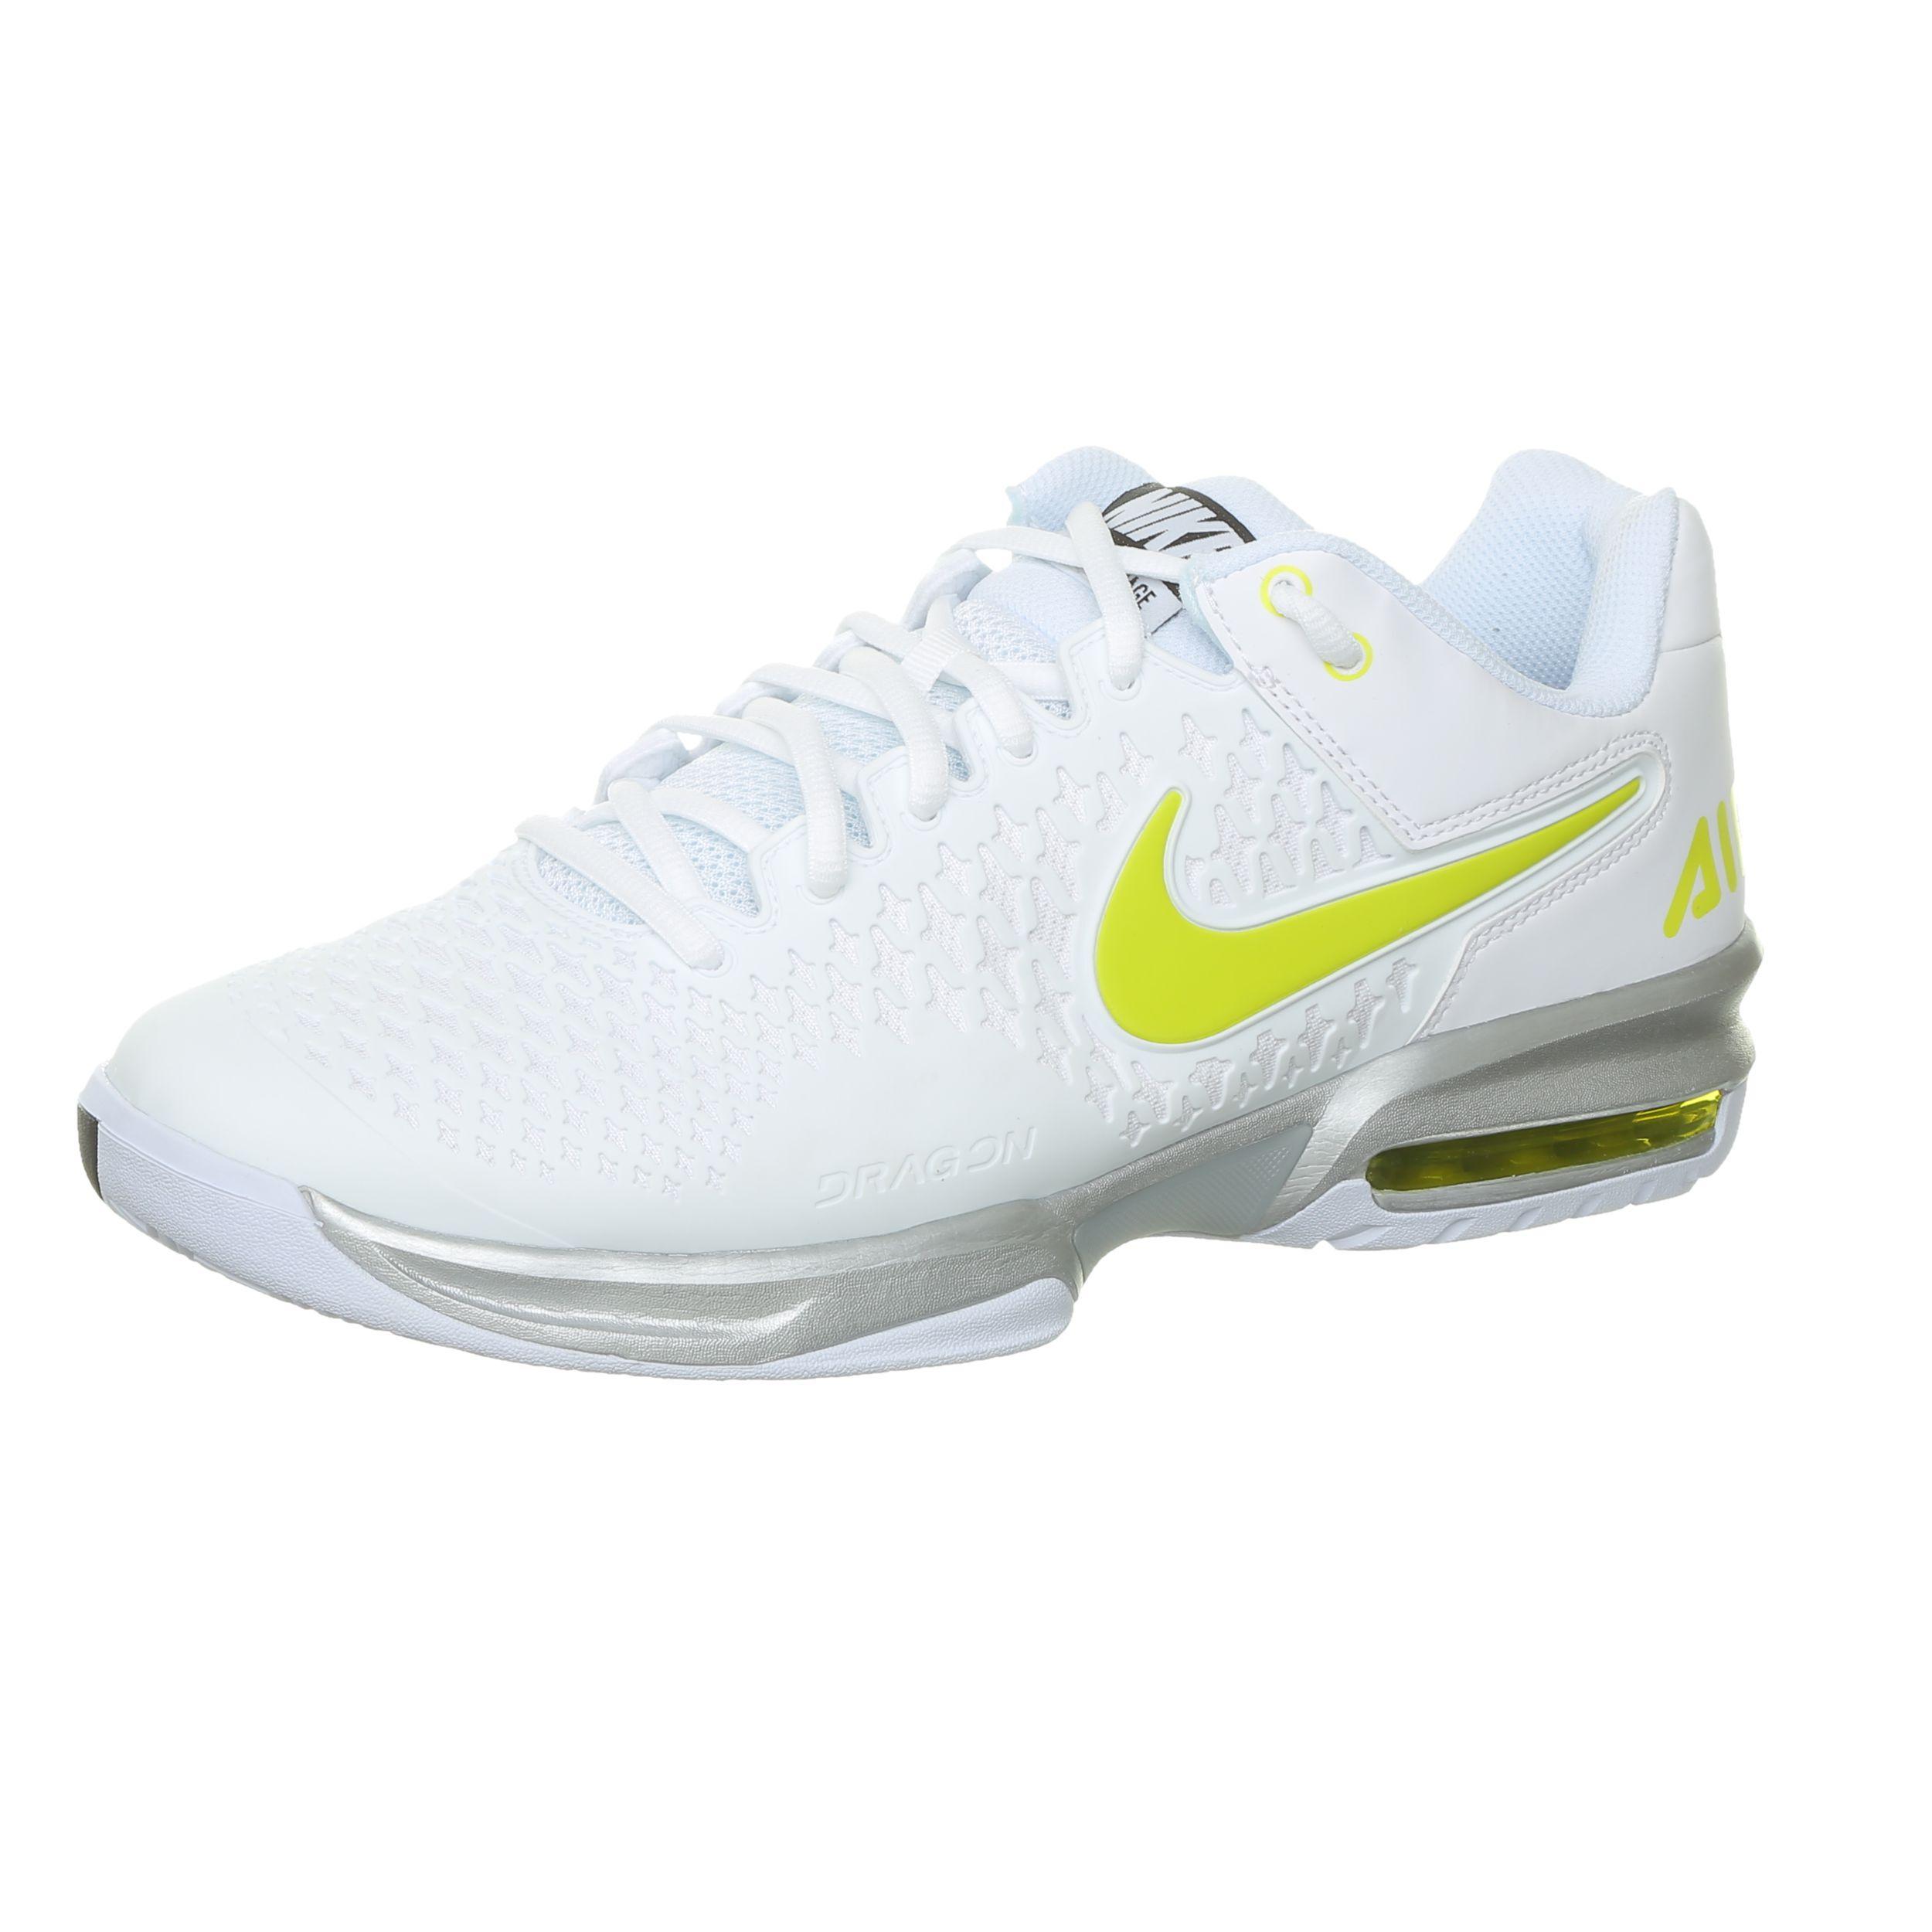 Santo Apelar a ser atractivo petrolero  Nike Juan Martin Del Potro Air Max Cage